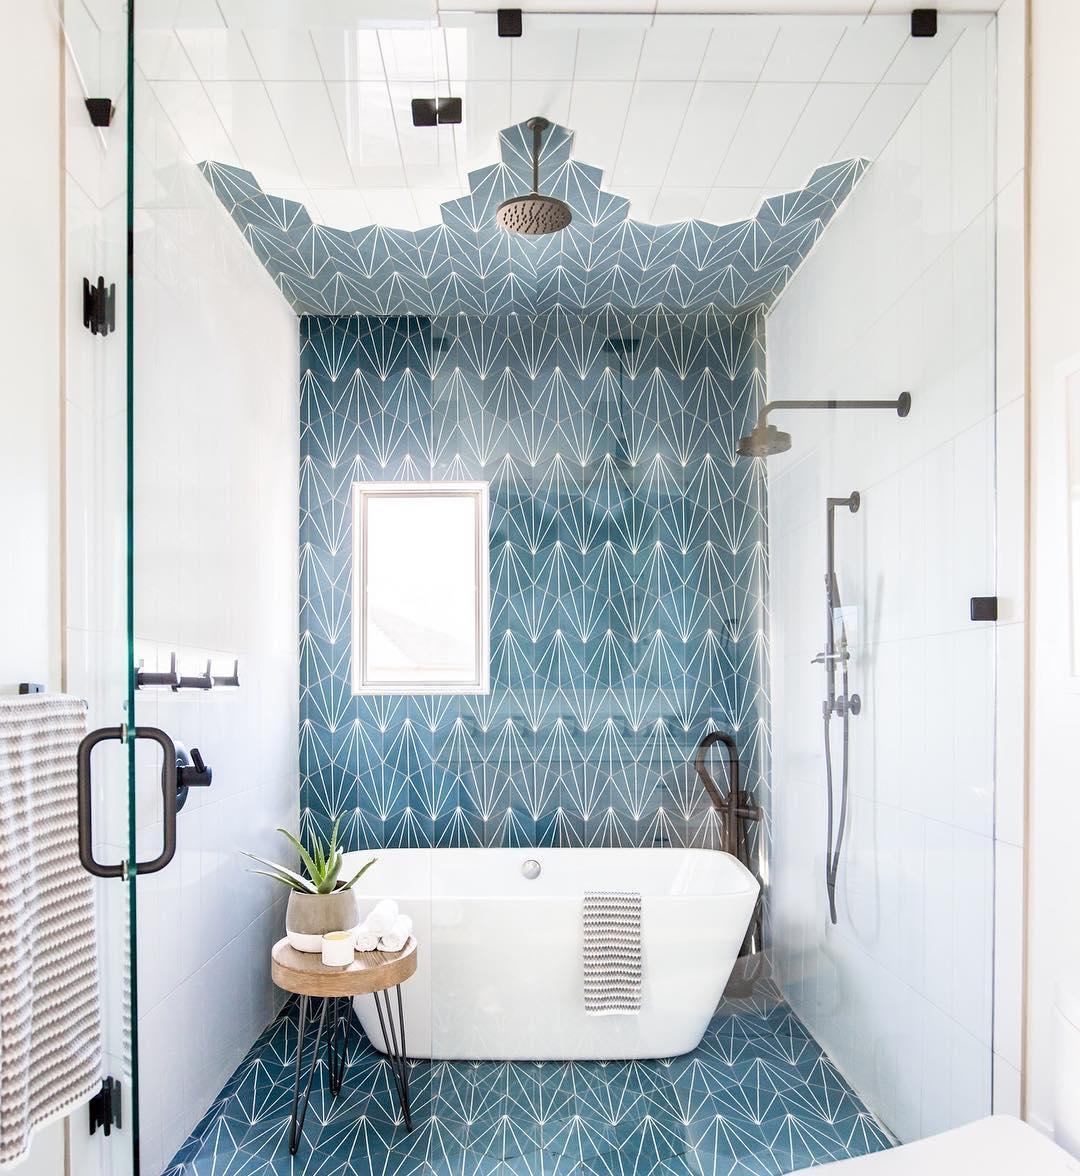 6 Bathroom Shower Ideas So Chic You'll Reconsider Your Clawfoot Tub Obsession